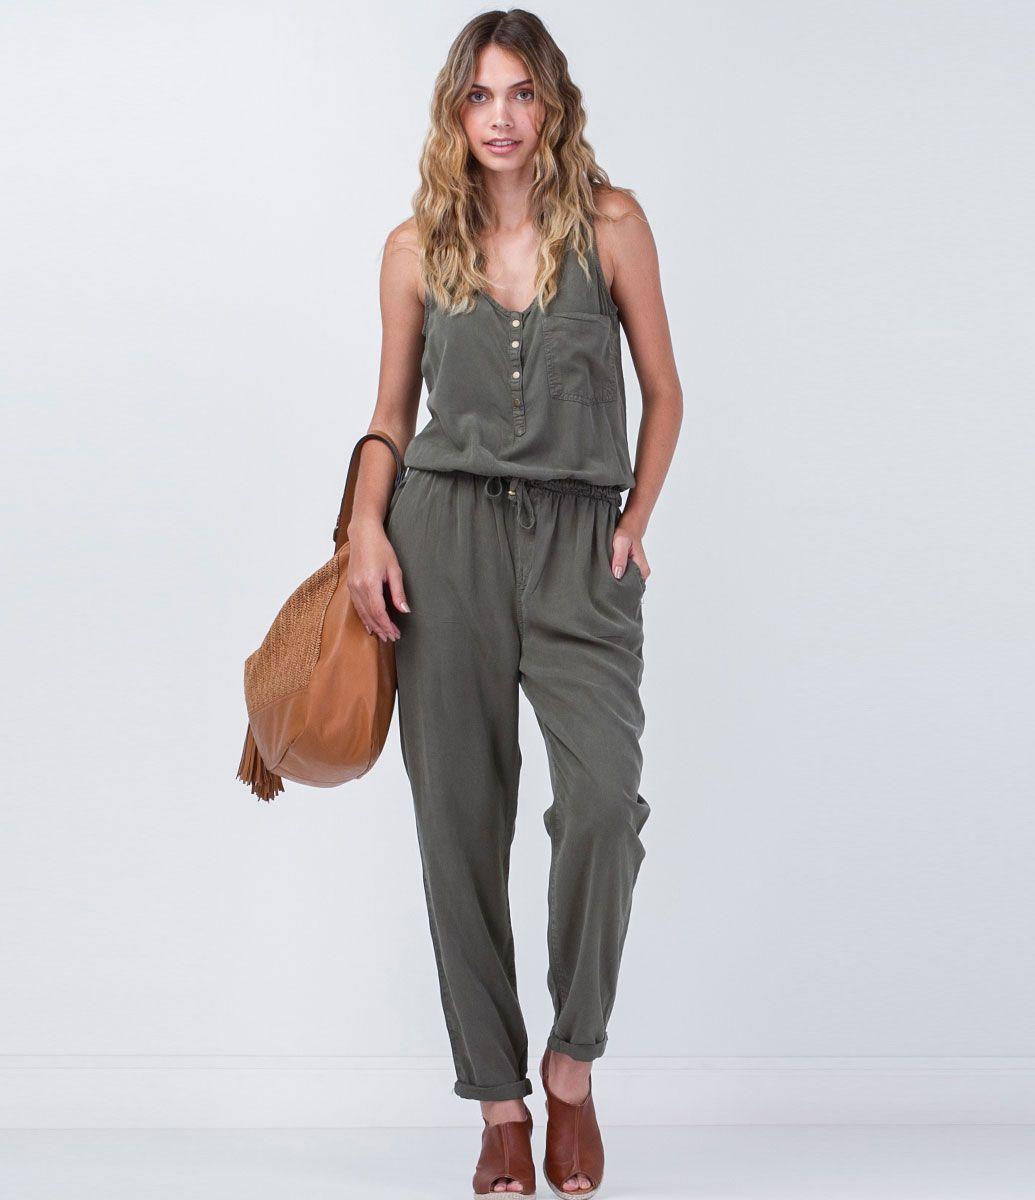 Lojas Renner BR: Vestidos e macacões pro outono | Milled